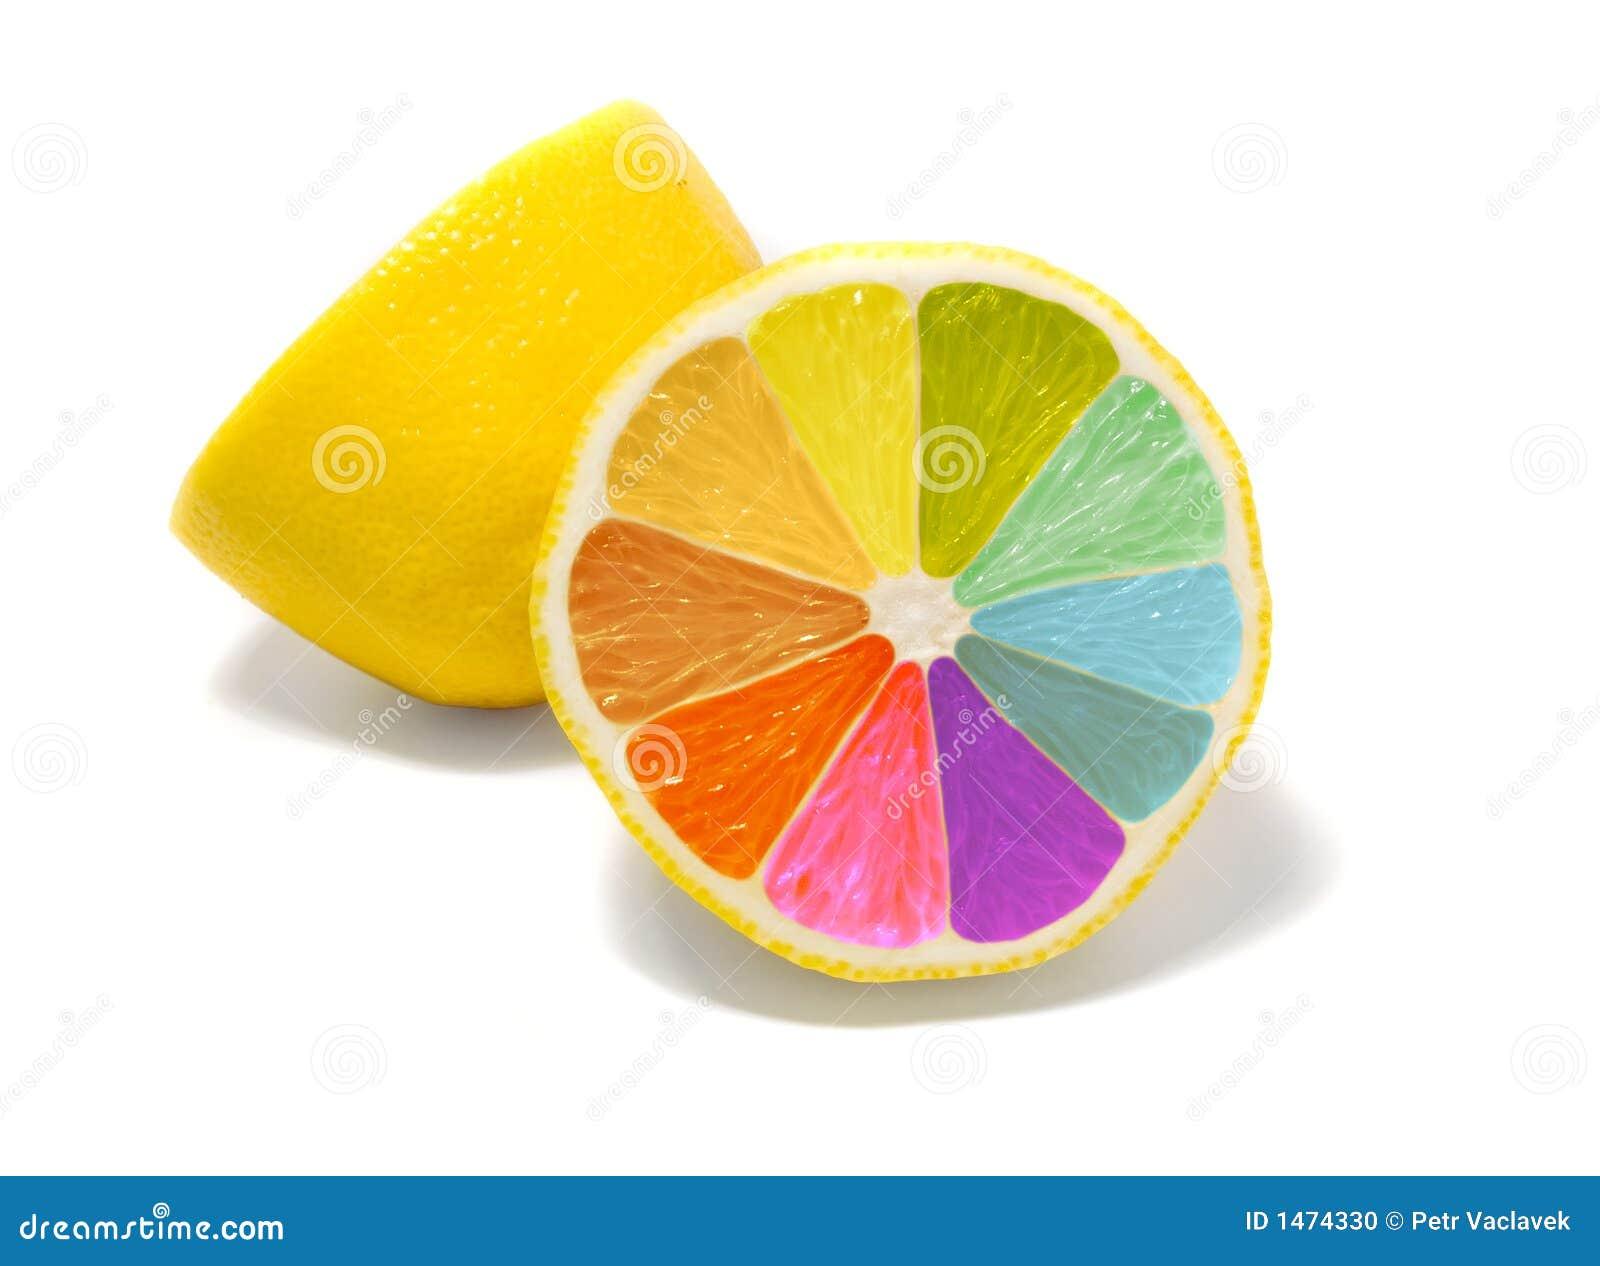 Farbige Zitrone